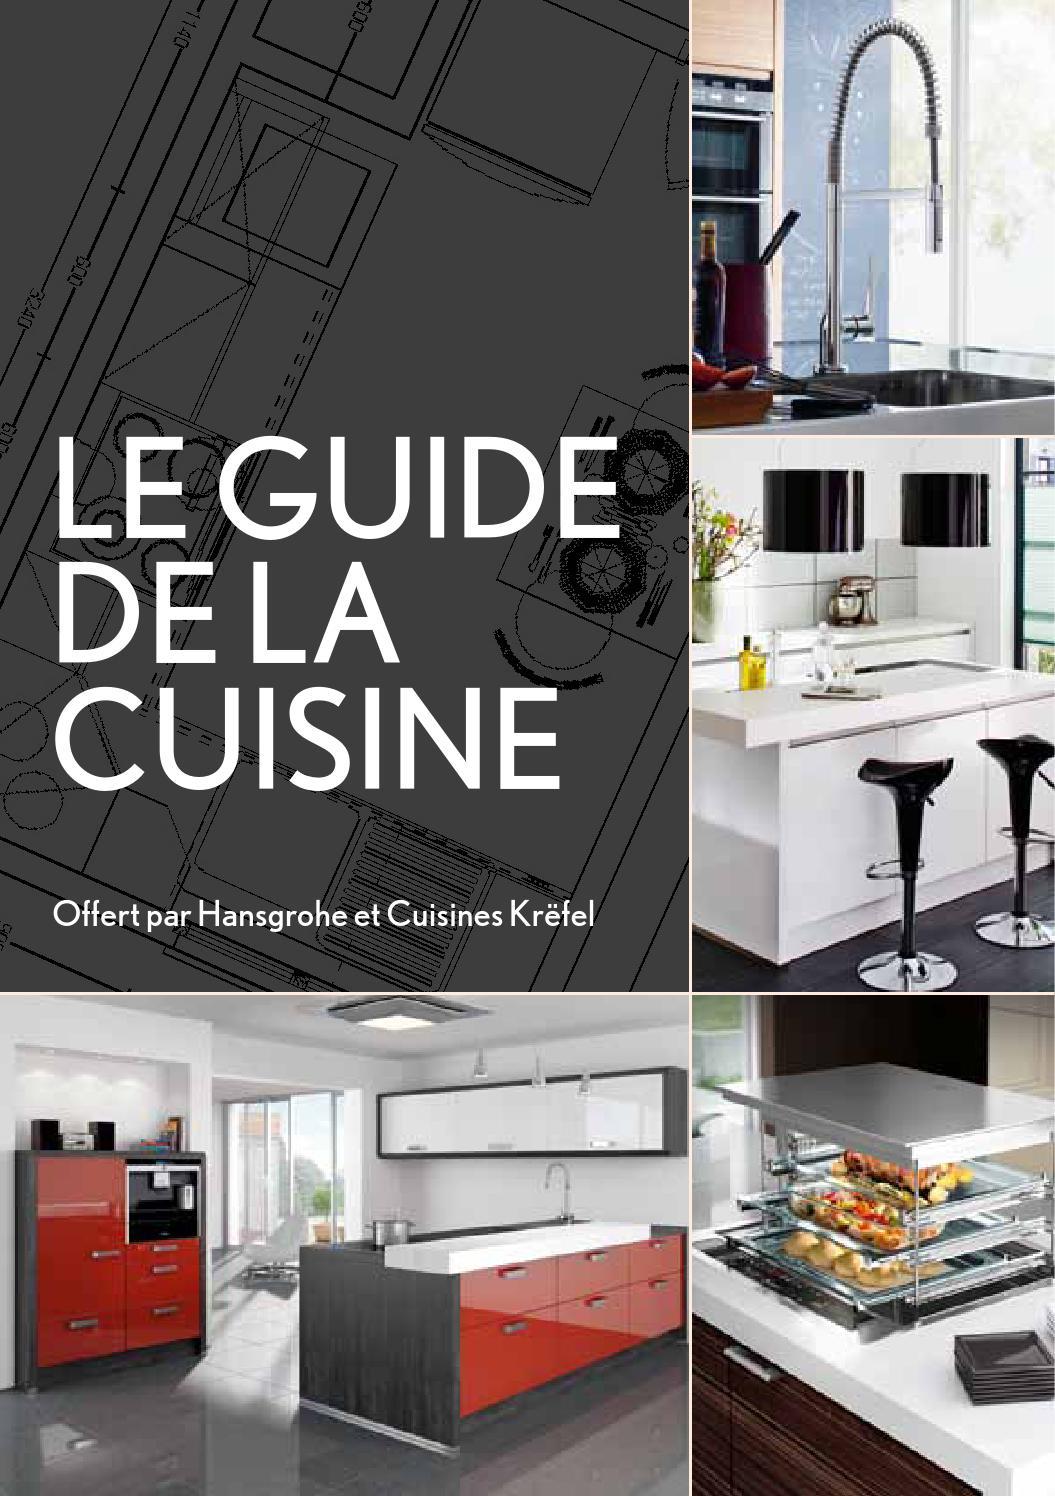 Cuisiniere A Bois La Cornue le guide de la cuisinehansgrohe nv/sa - issuu